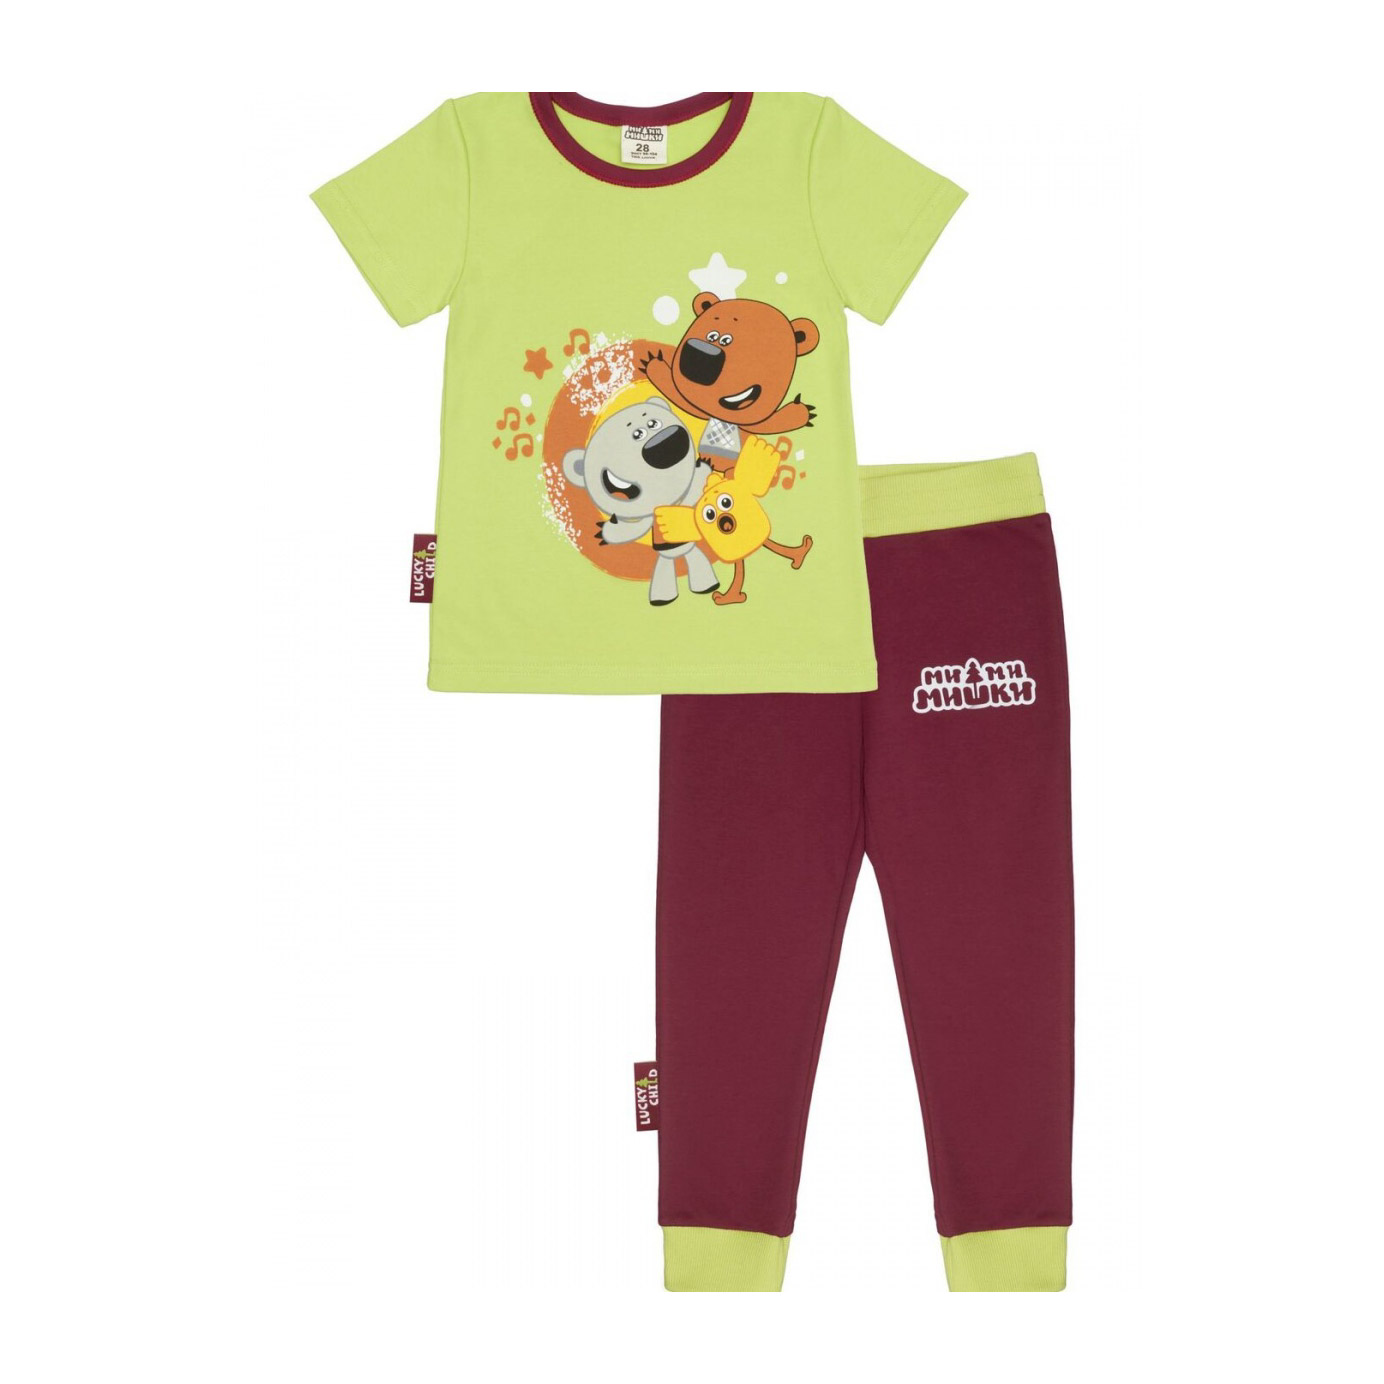 Фото - Пижама Lucky Child с брюками МИ-МИ-МИШКИ зеленая 92-98 пижама lucky child размер 28 92 98 полосатый